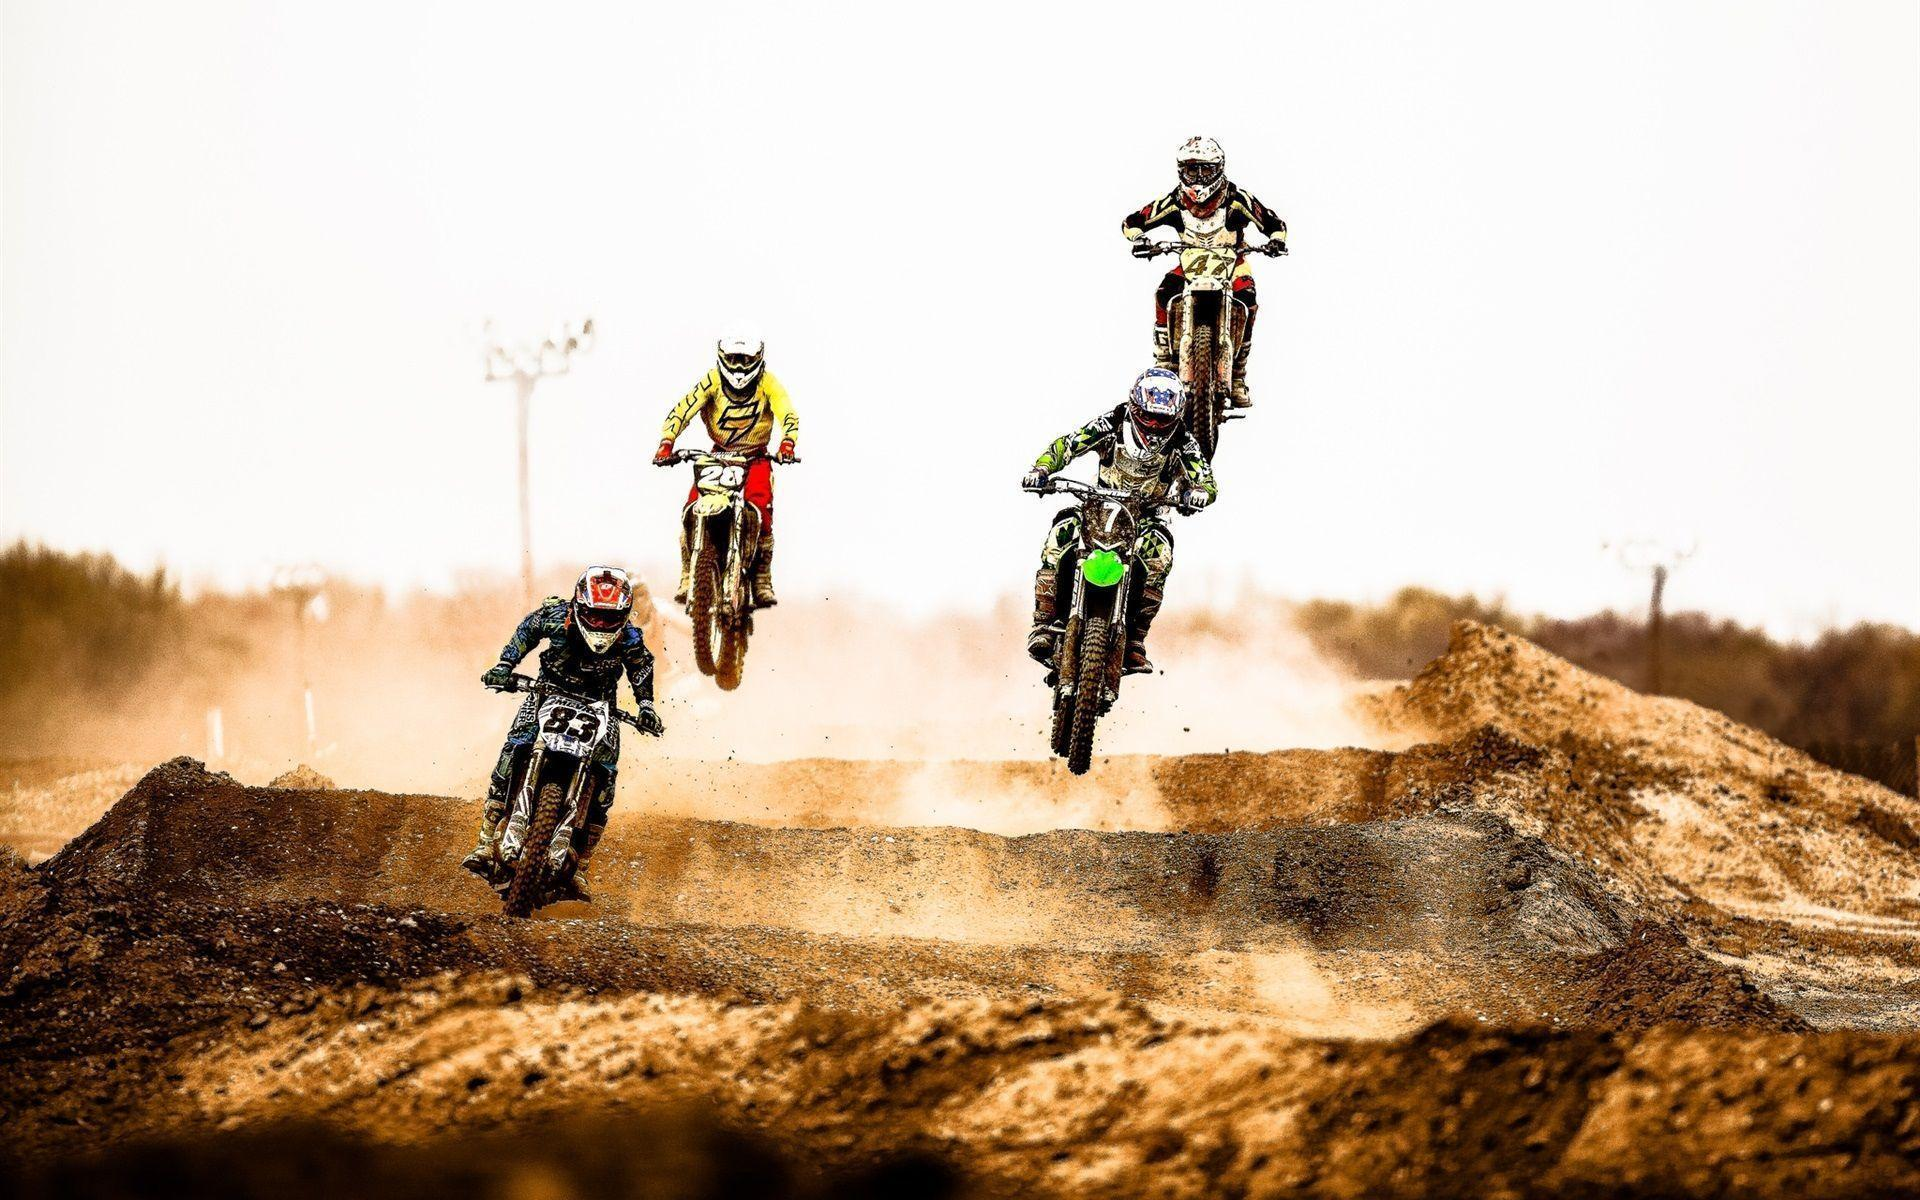 Motocross Wallpapers 2016 1920x1200